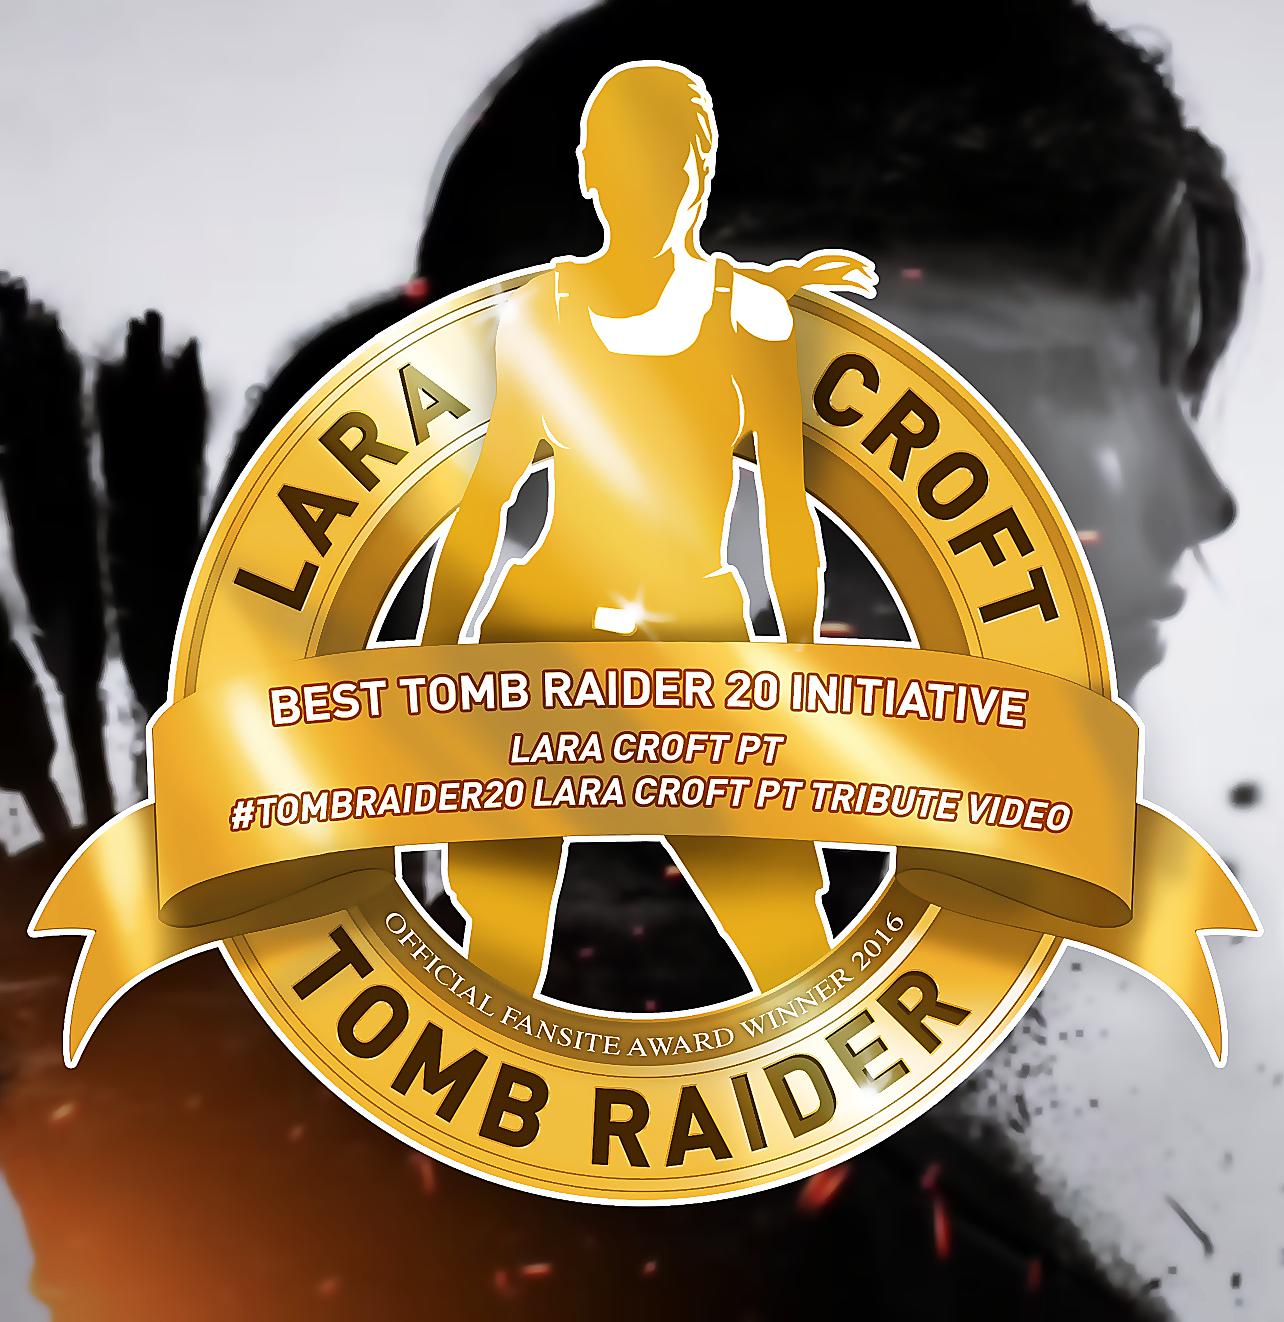 Fansite Oficial Premiado pela Crystal Dynamics